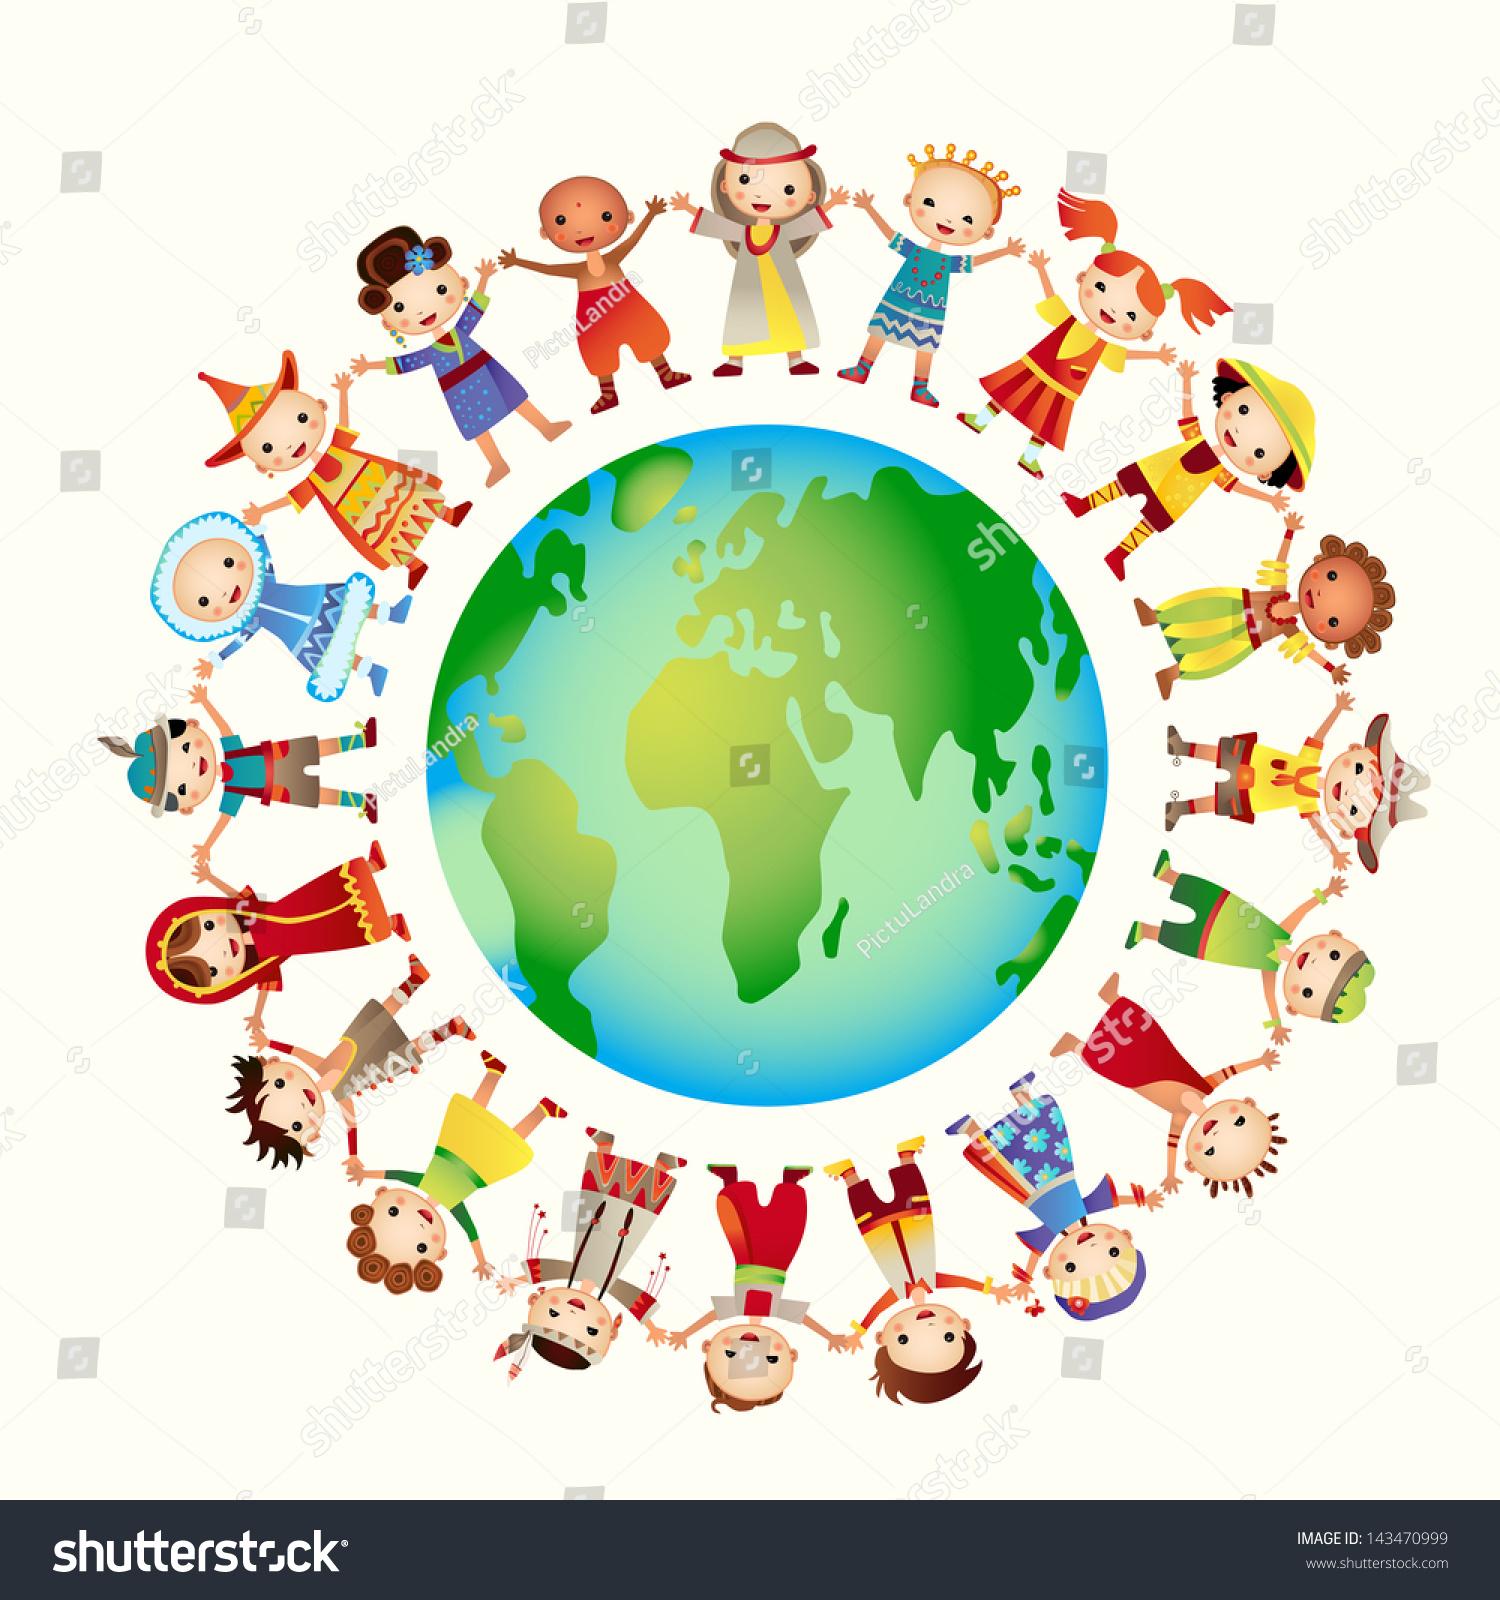 What Are Pluralistic Societies?